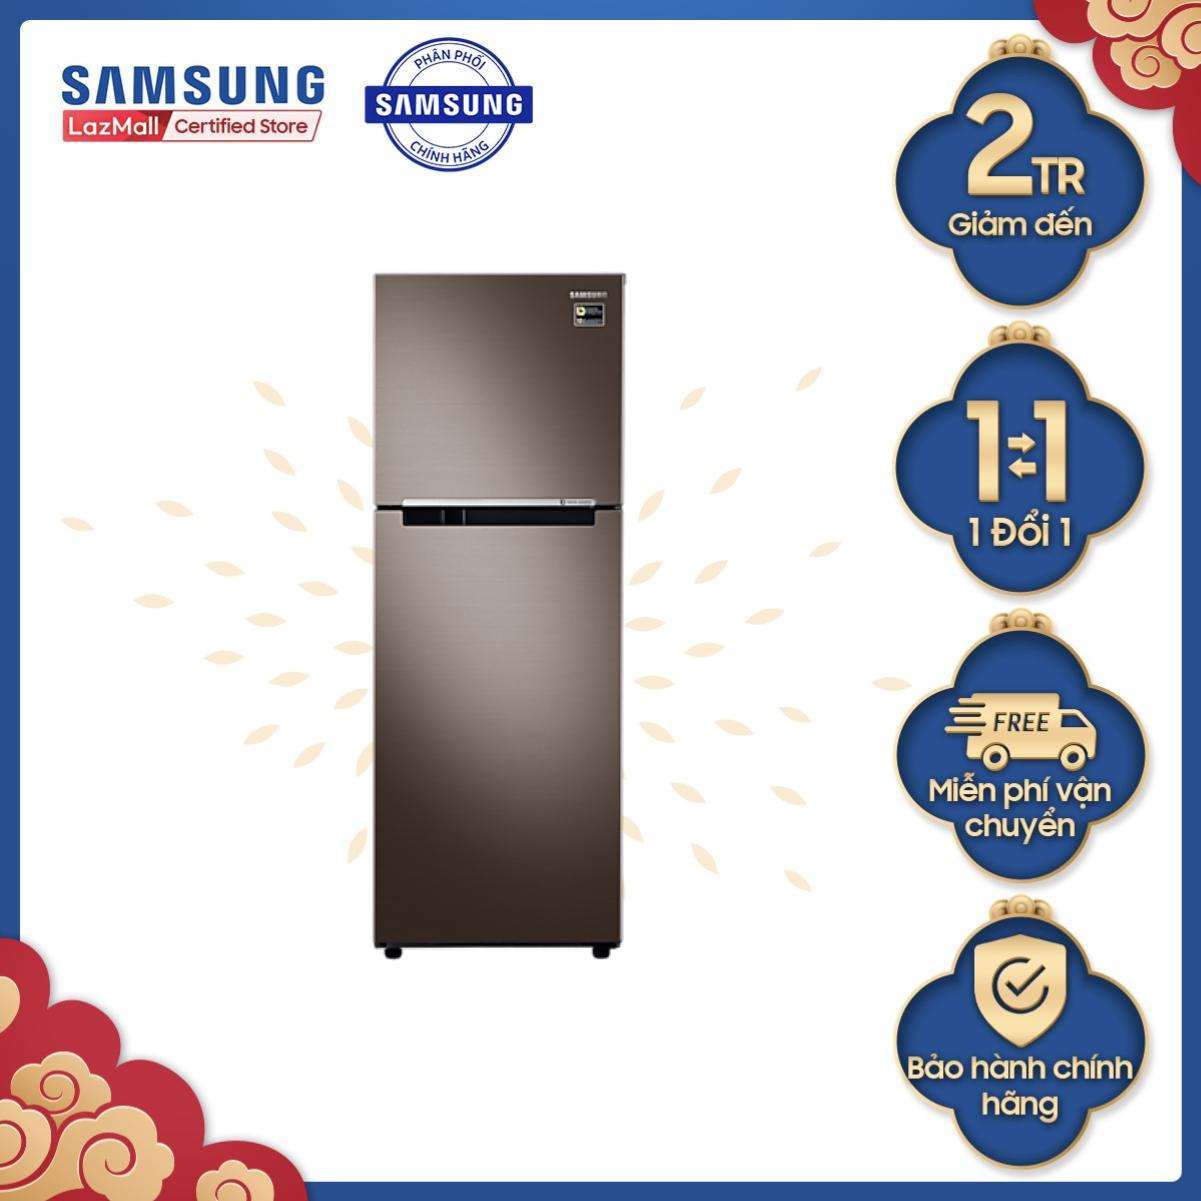 ( Voucher 250K) Tủ lạnh Samsung hai cửa Digital Inverter 243L (RT22M4040DX)